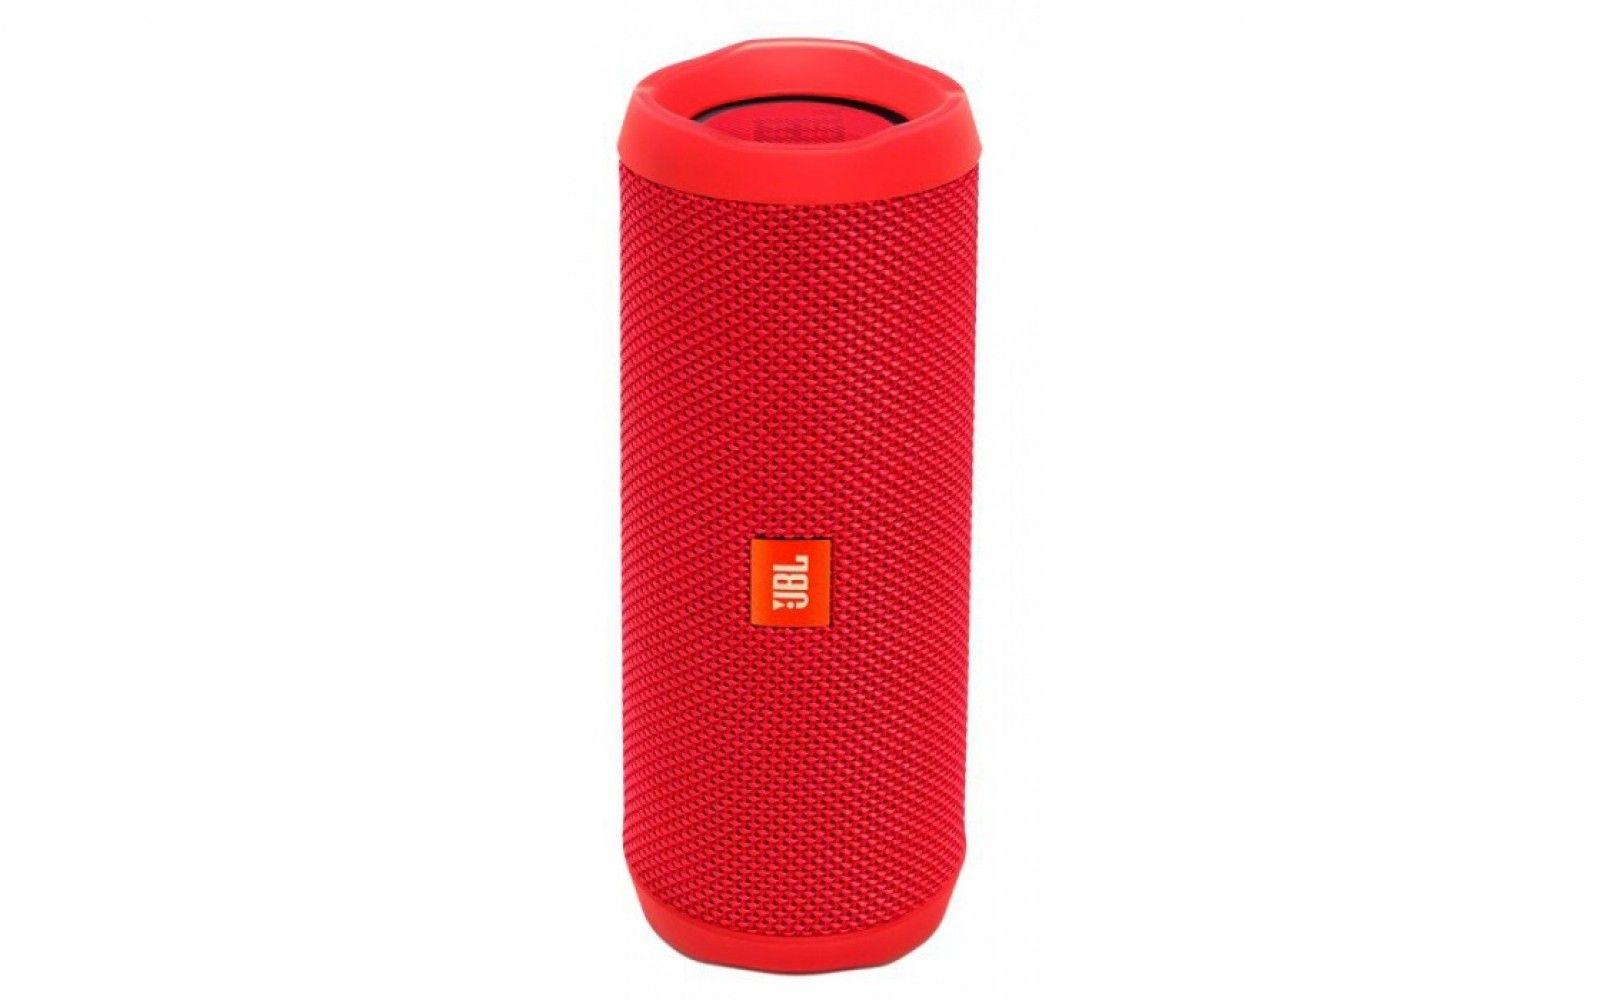 Купить Портативная акустика JBL Flip 4 Red (JBLFLIP4RED)